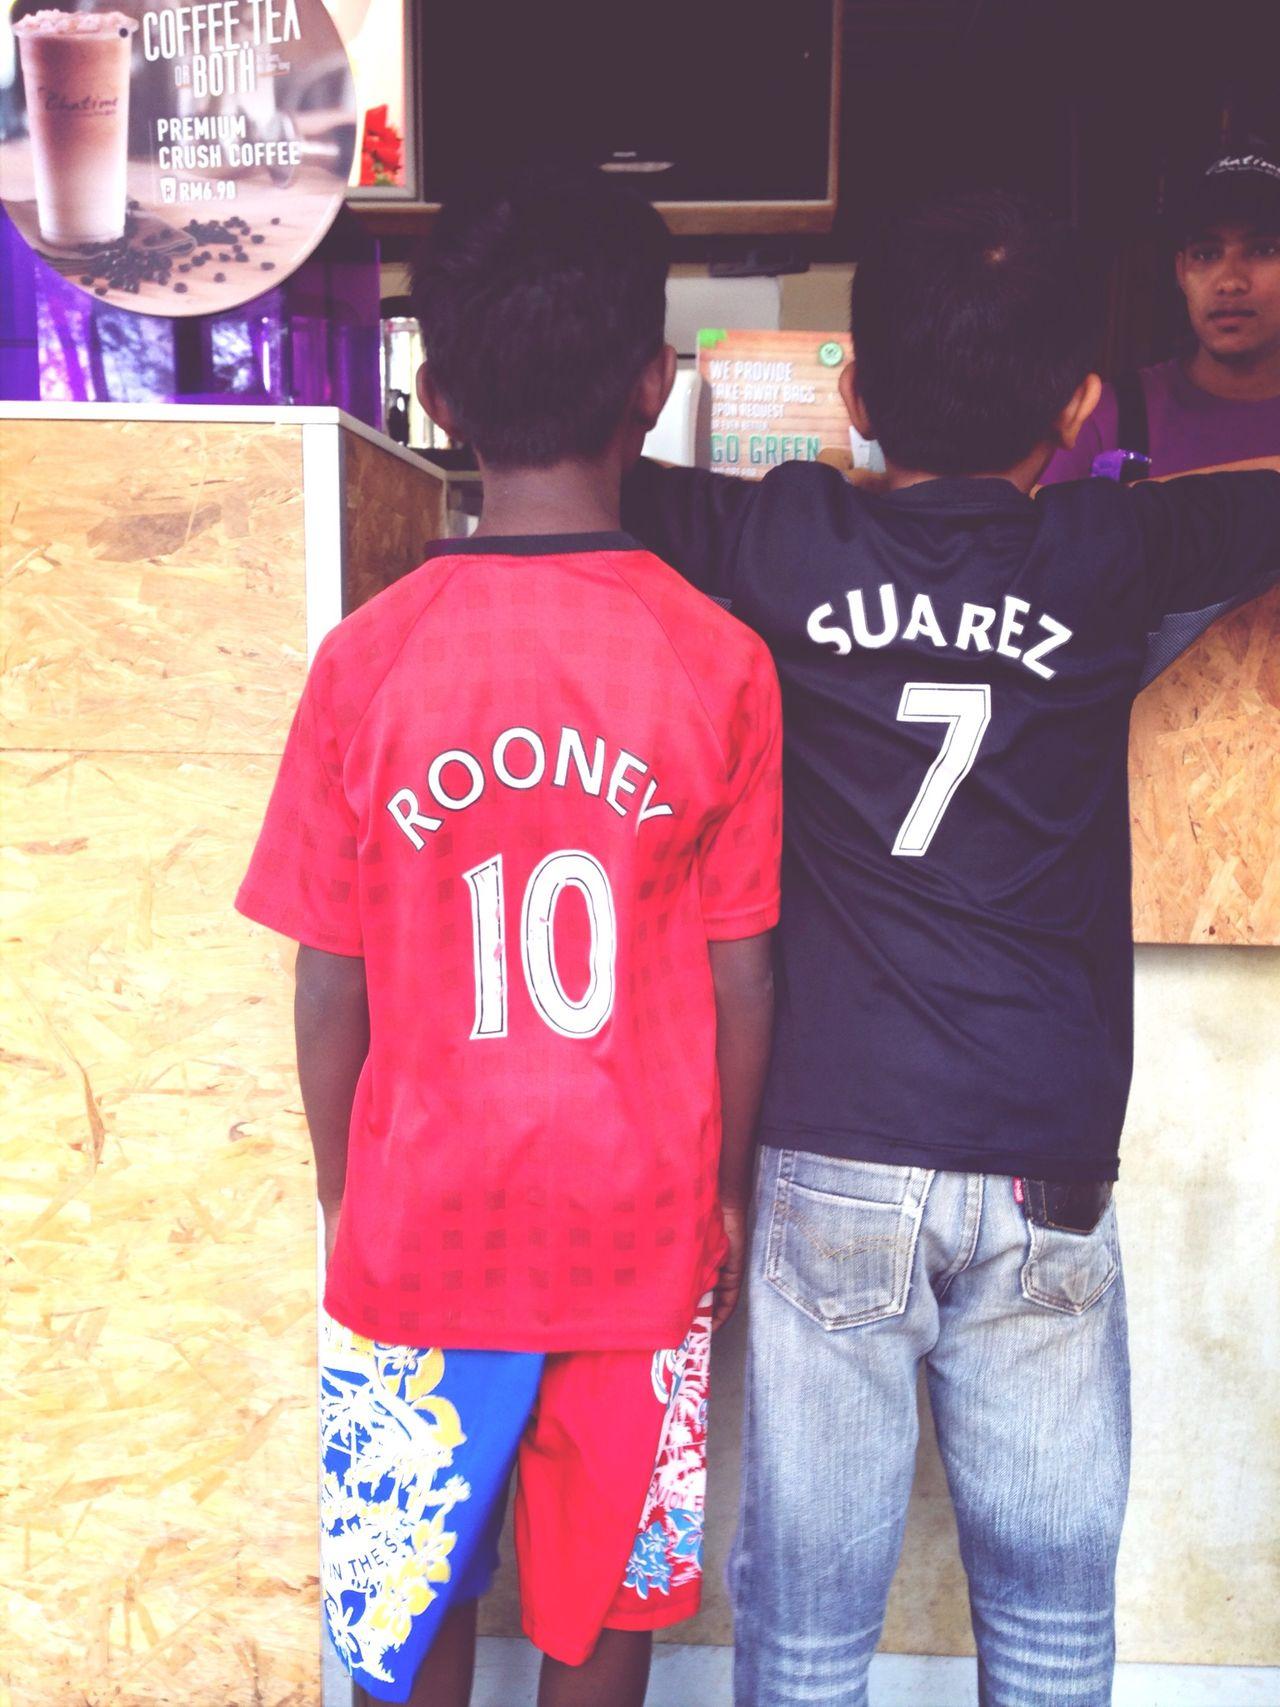 Rooney and Luis Suarez